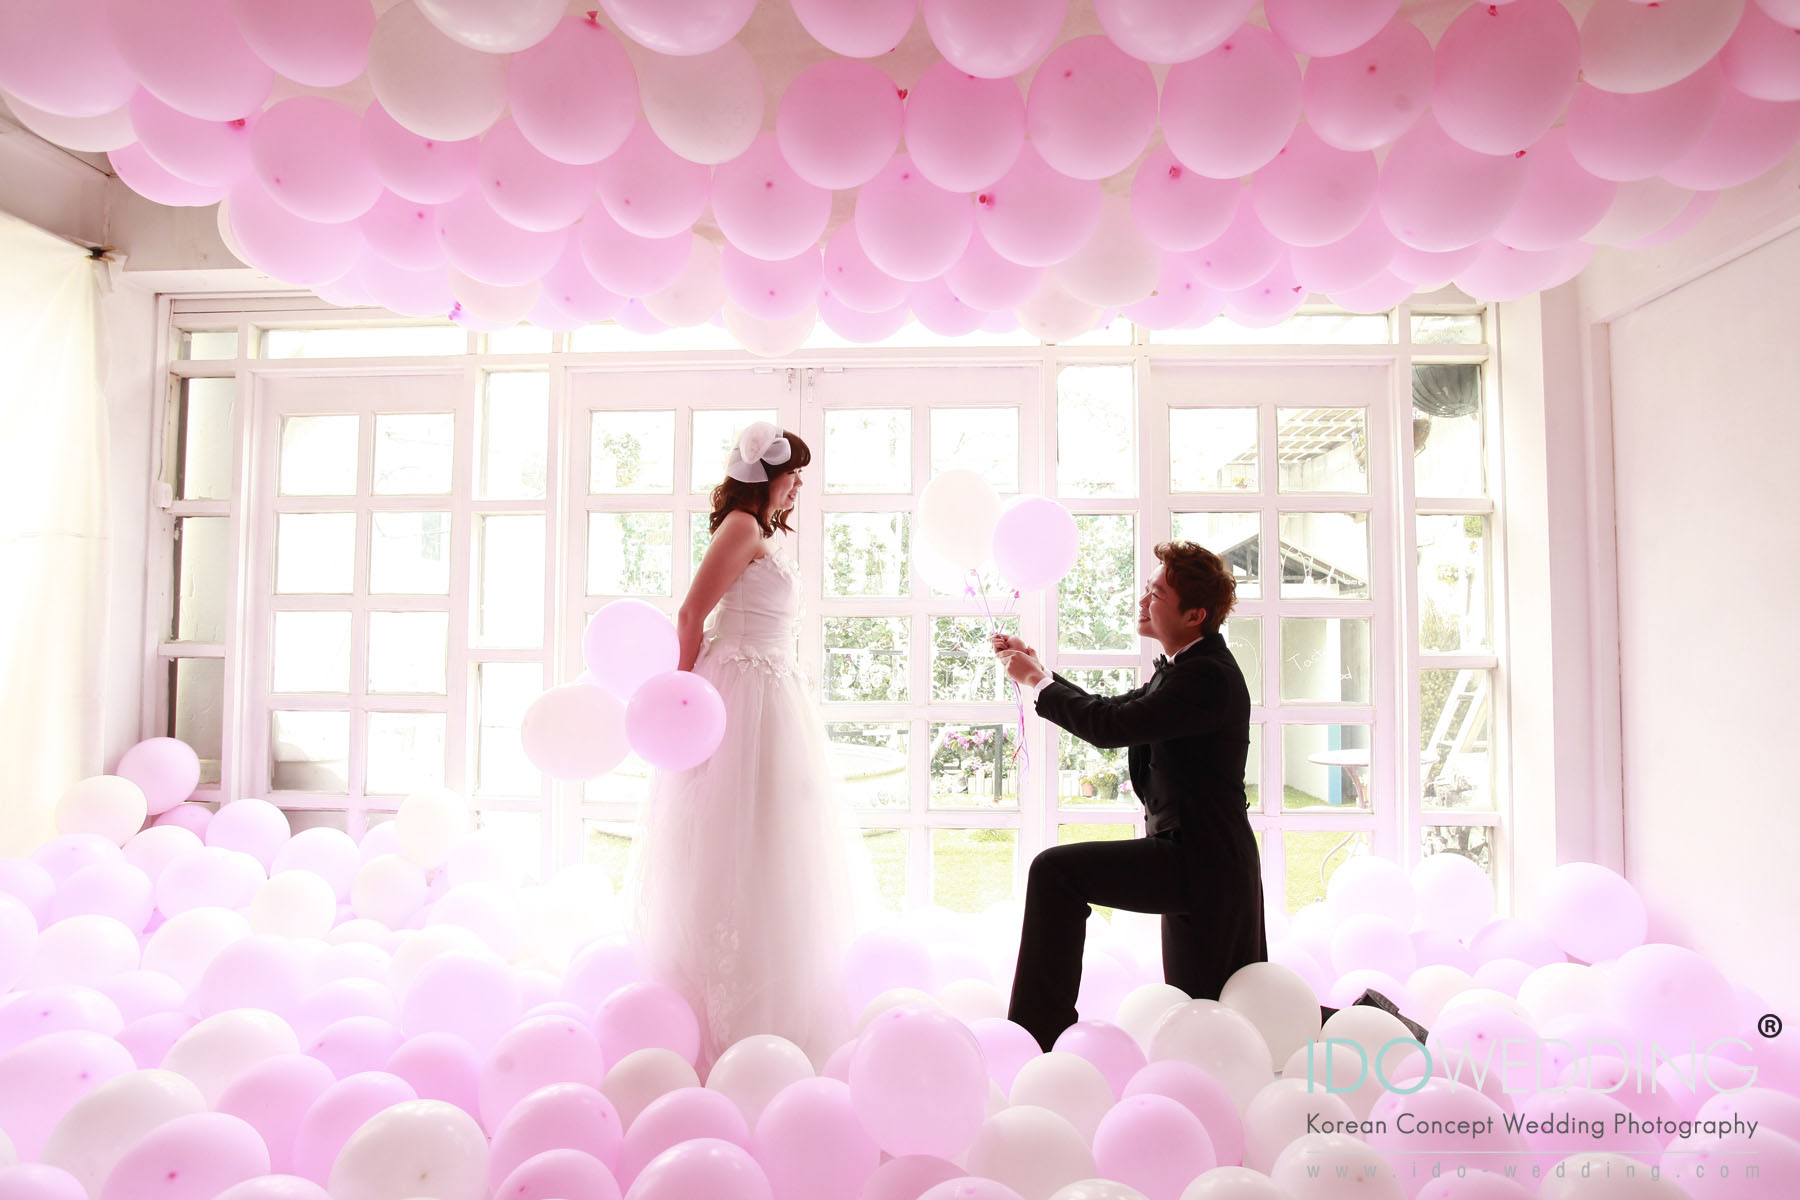 Gallerykorean wedding photo seoul korean wedding photo ido korea wedding korea wedding photo korean wedding photography korean pre wedding photo junglespirit Image collections